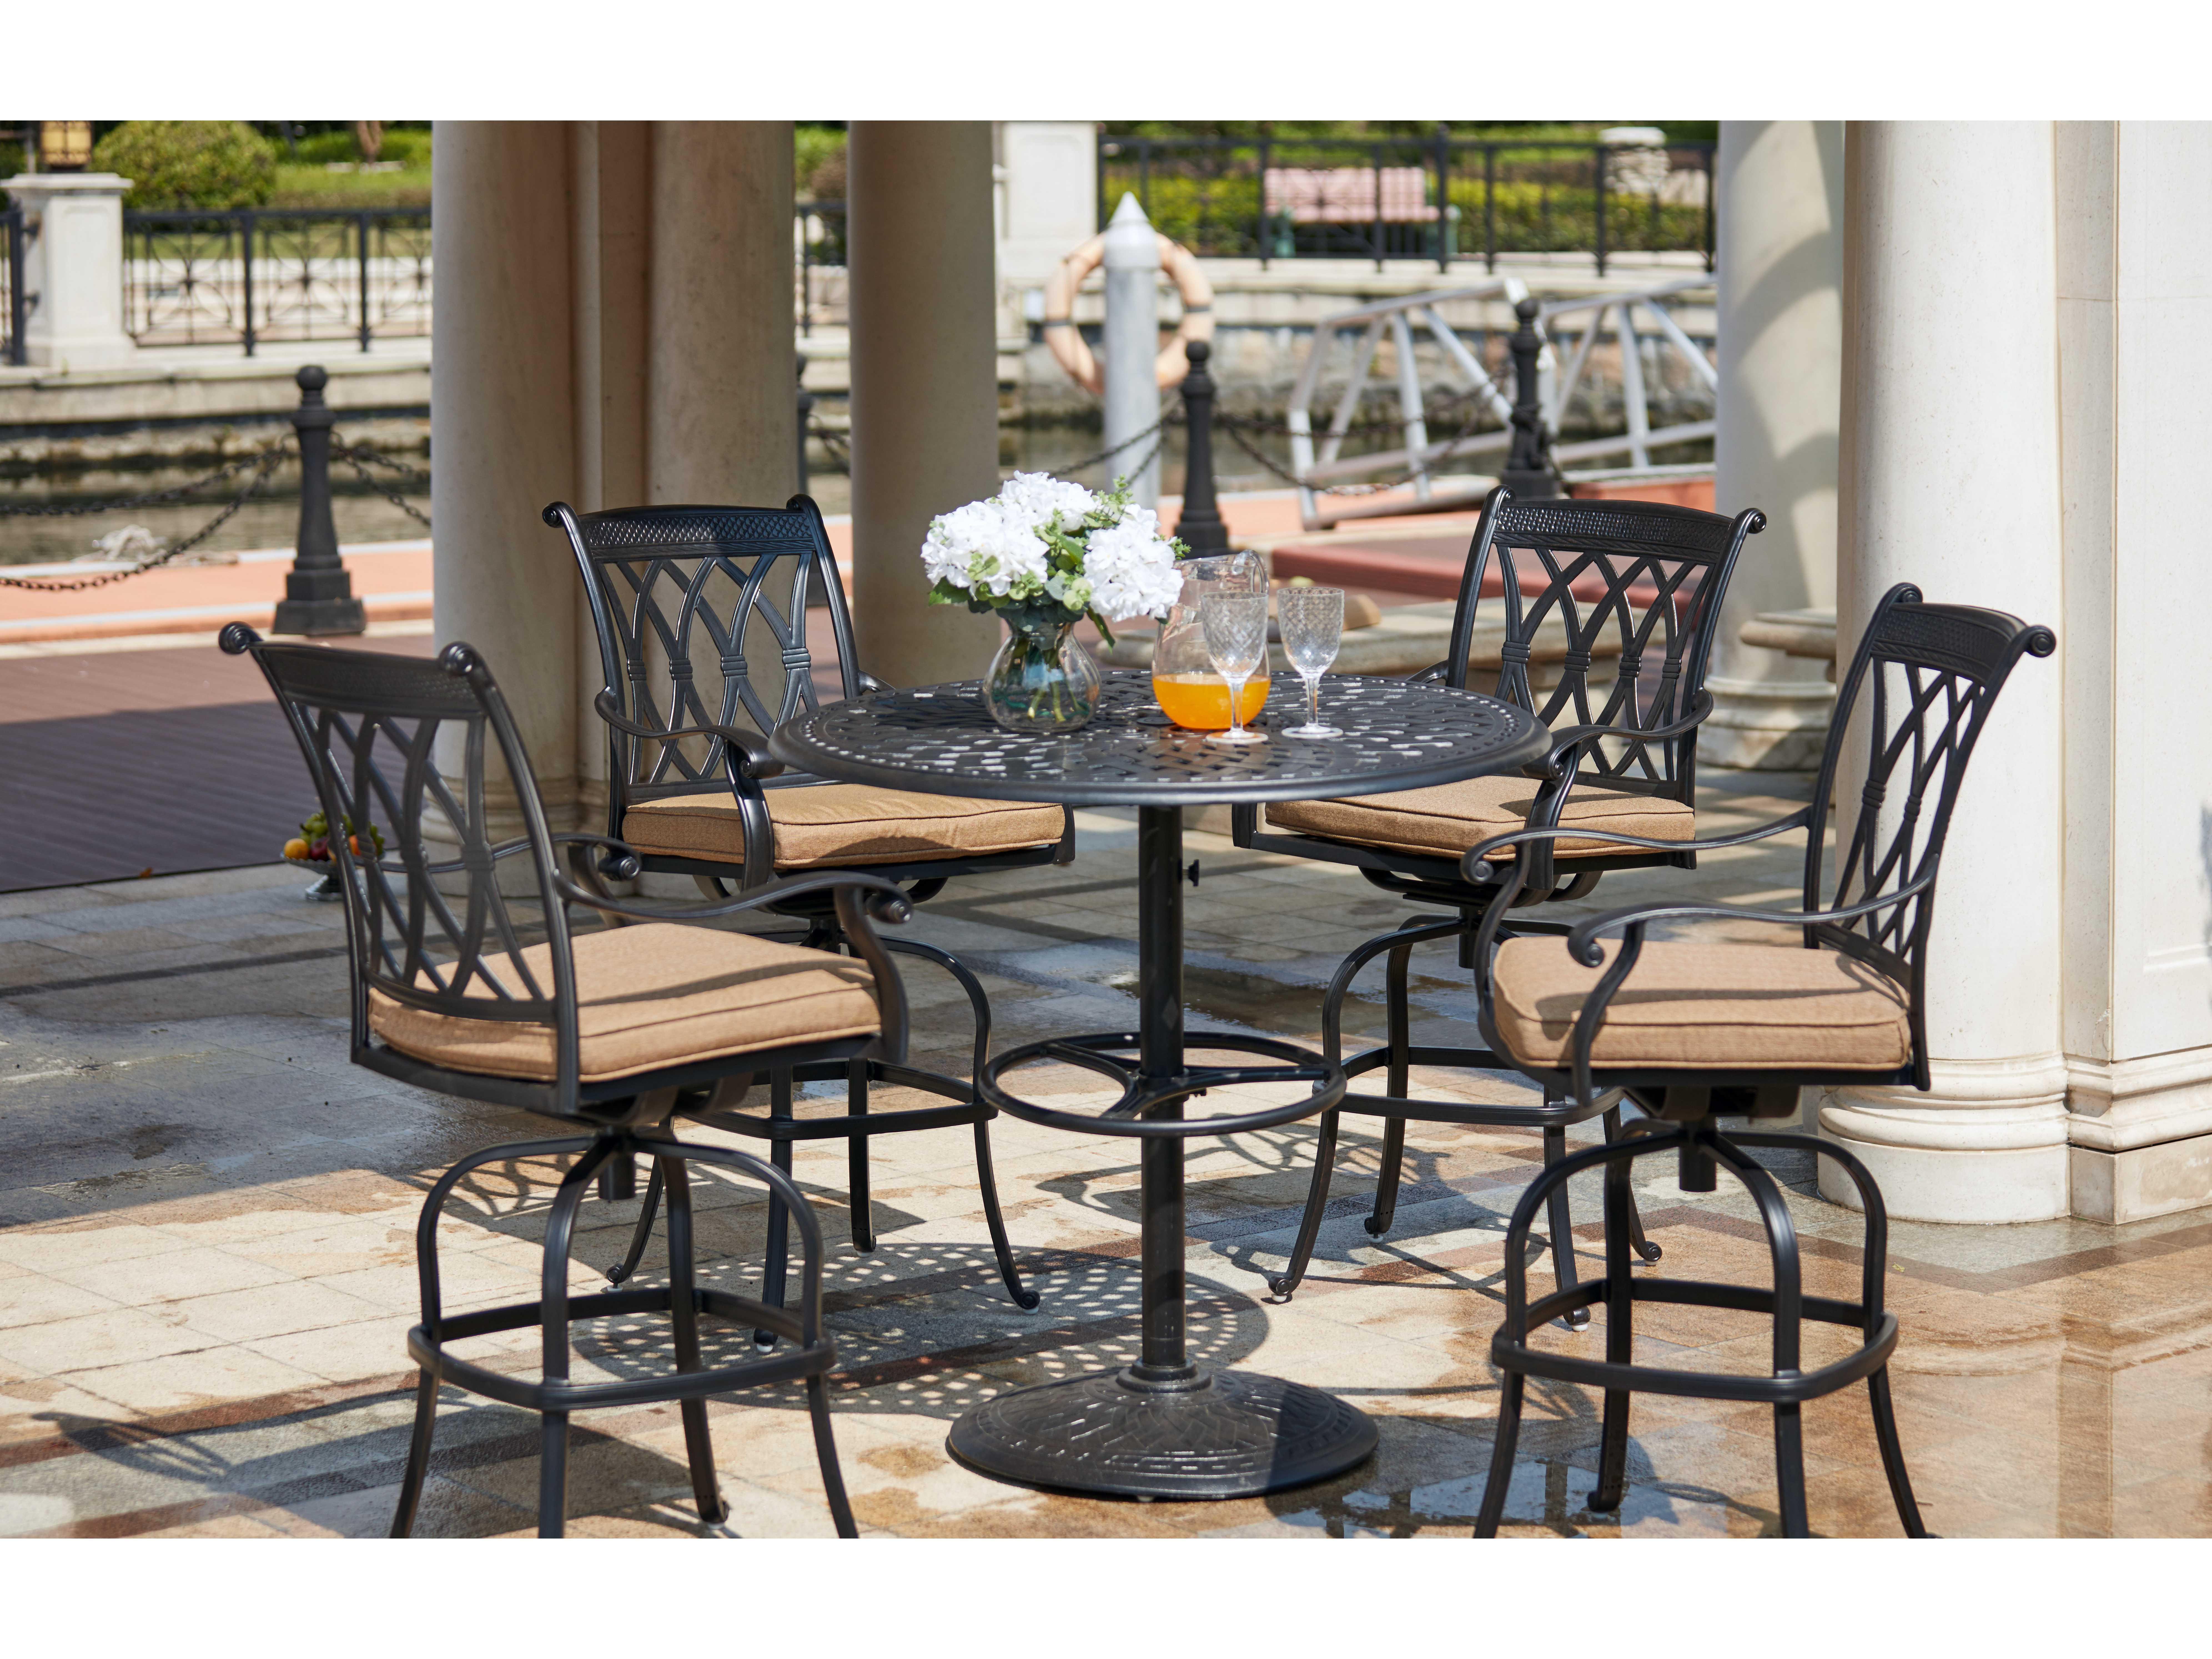 Darlee Outdoor Living Standard Capri Cast Aluminum 5 Piece Pedestal Bar Set With 42 Inch Table In Antique Bronze